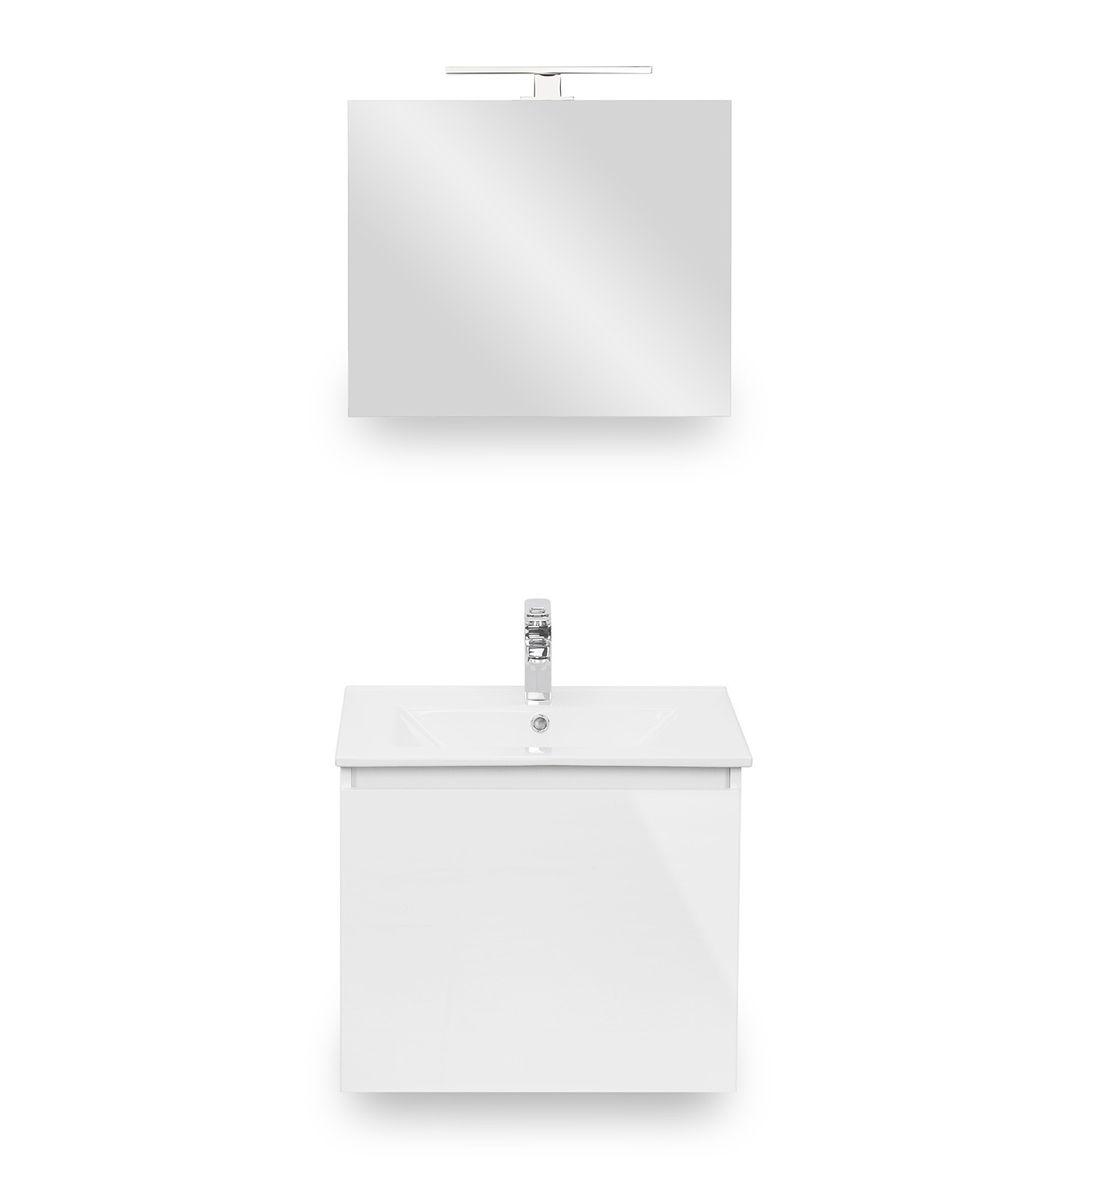 Galdem Bad-Set CUBE 60cm Weiß Hochglanz – Bild 2